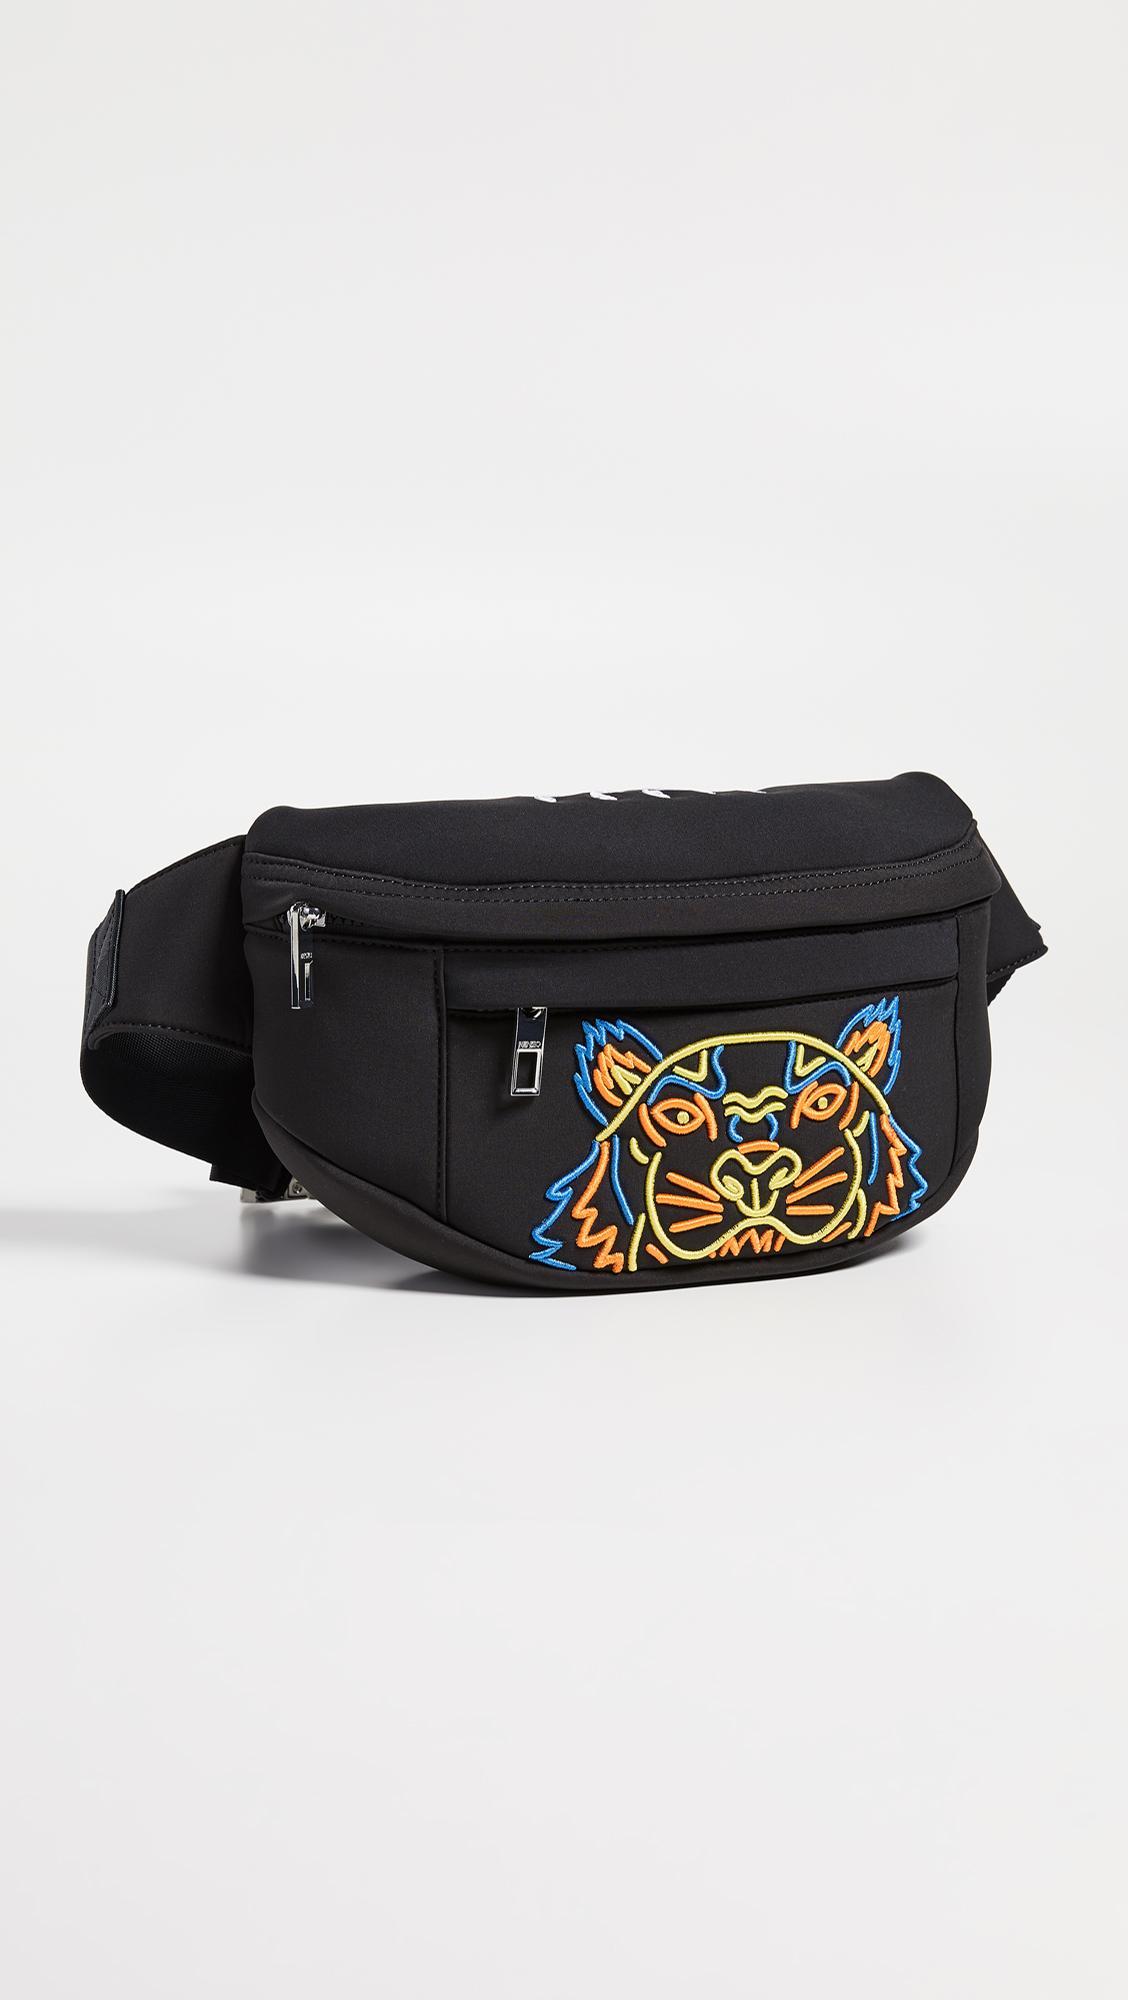 9a84f497 KENZO Black Neon Tiger Bum Bag for men